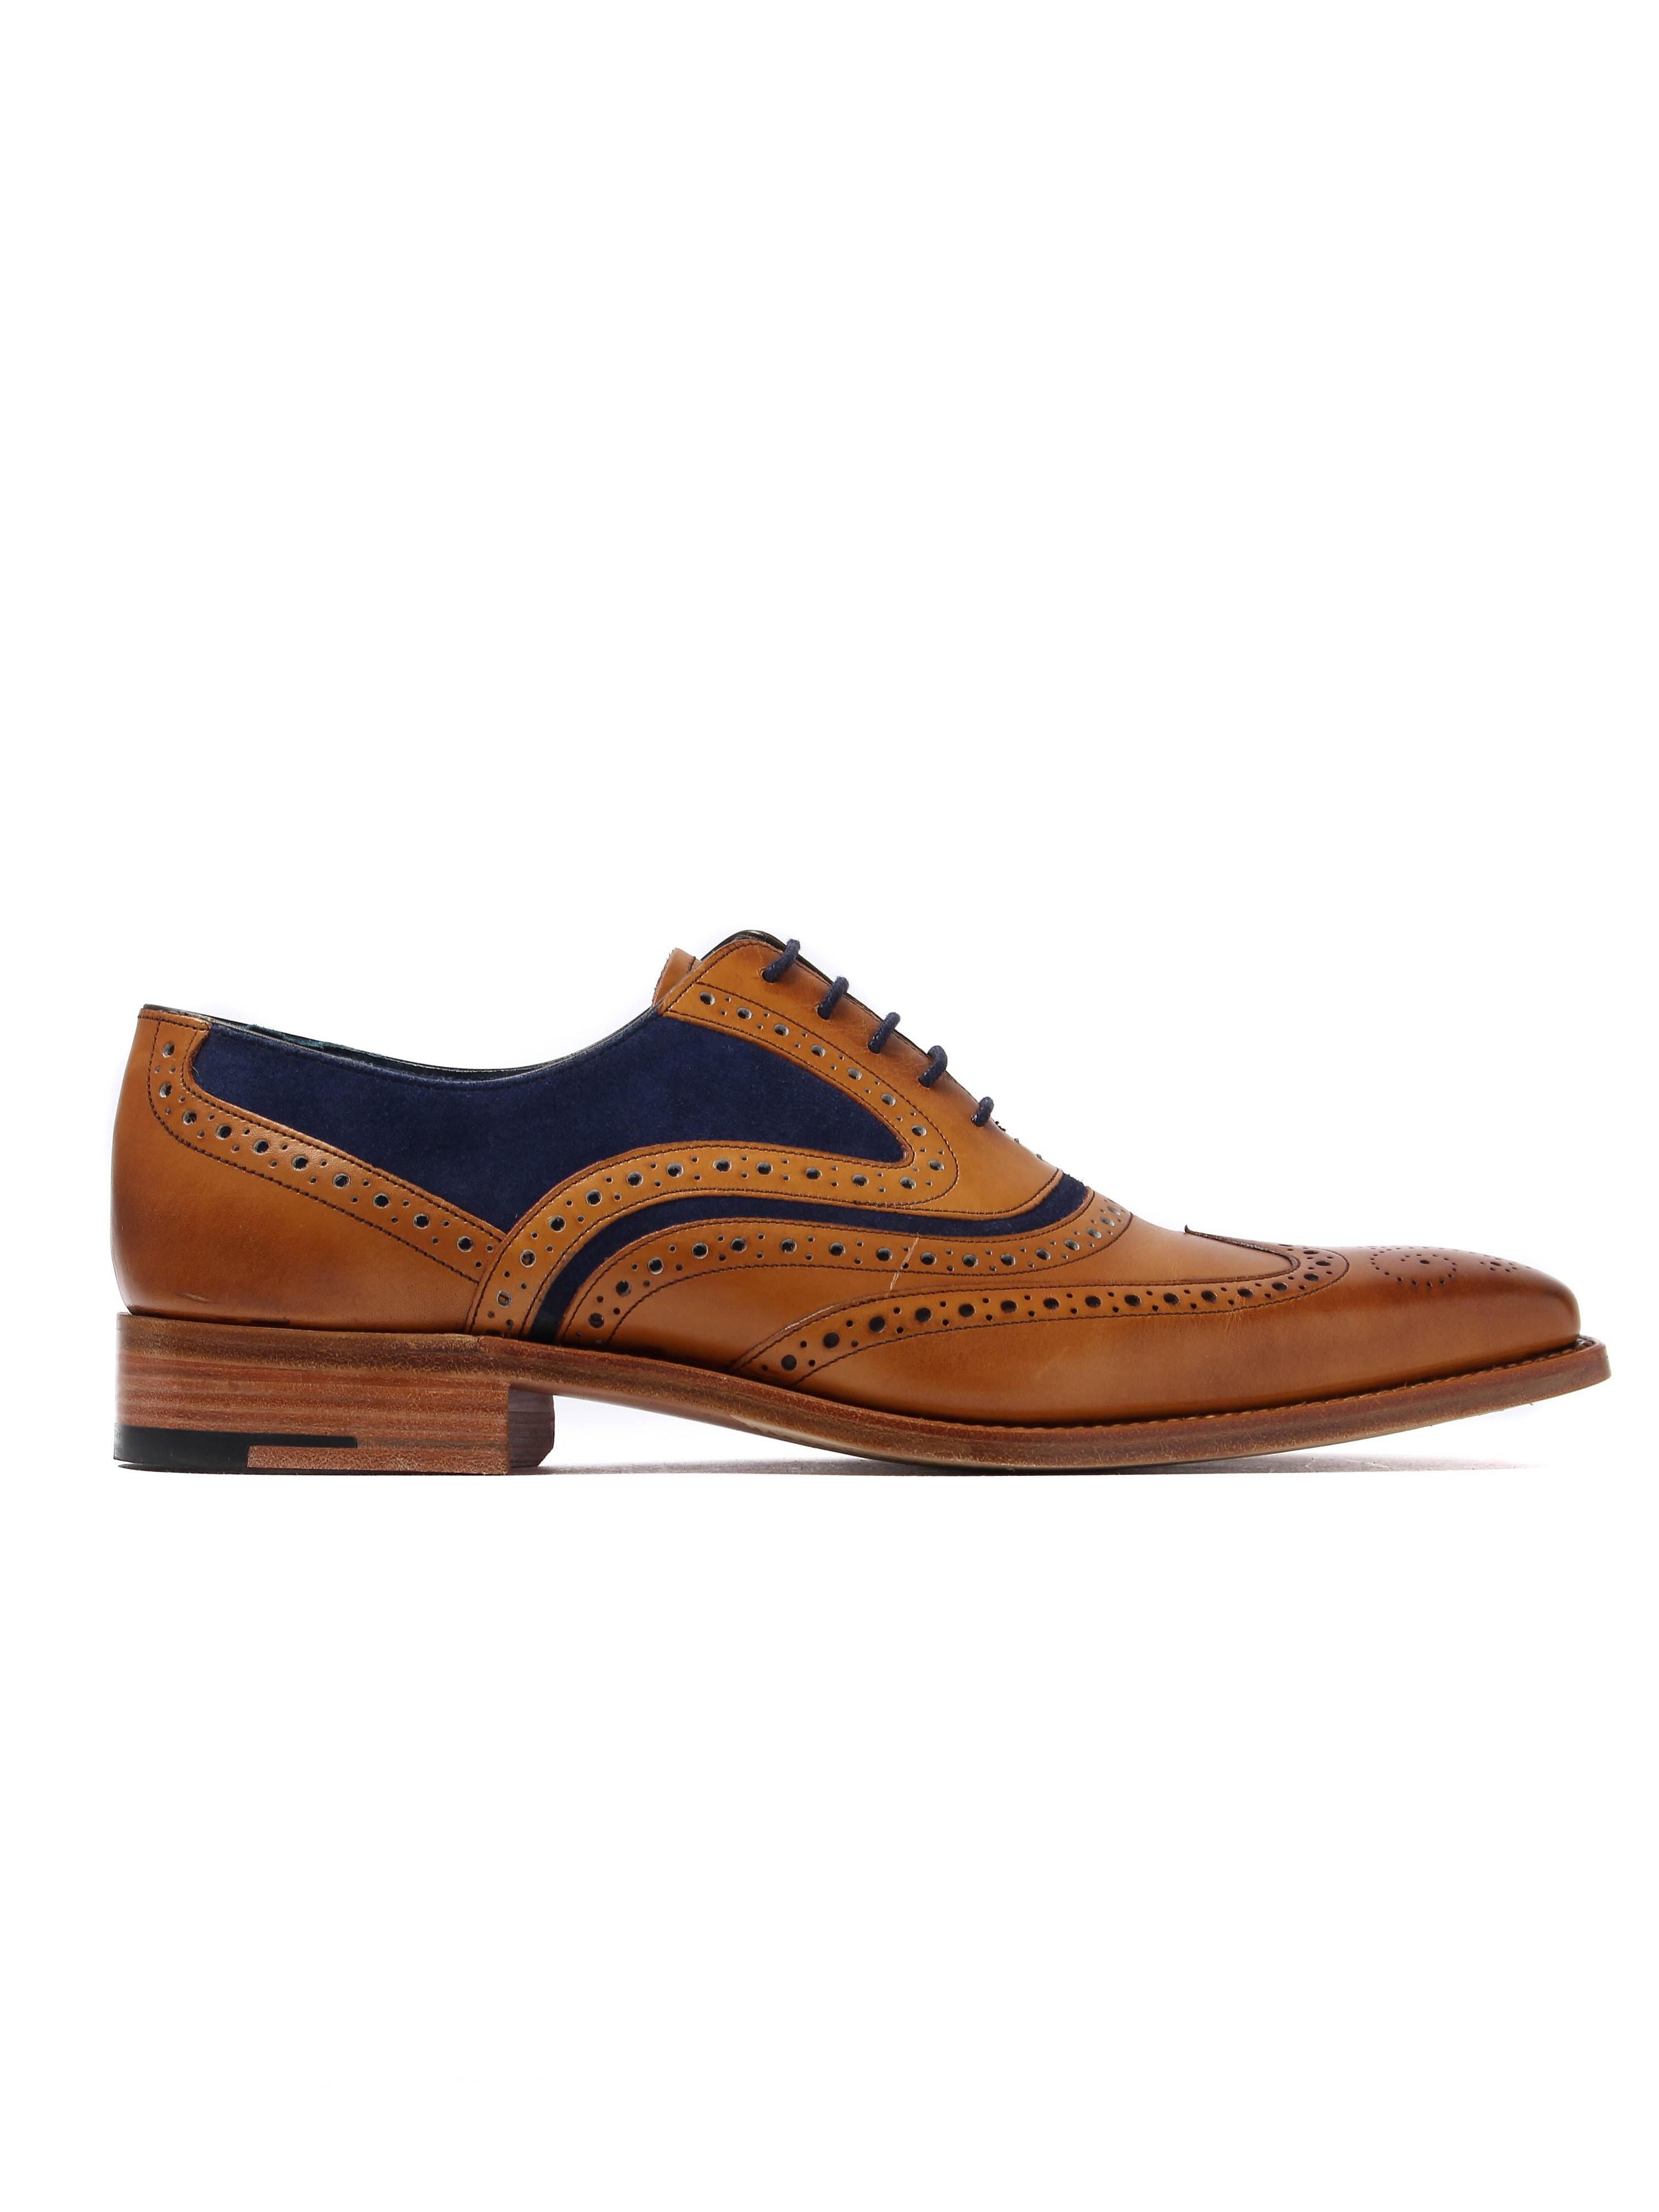 Barker Men's McClean Oxford Brogues - Cedar/Navy